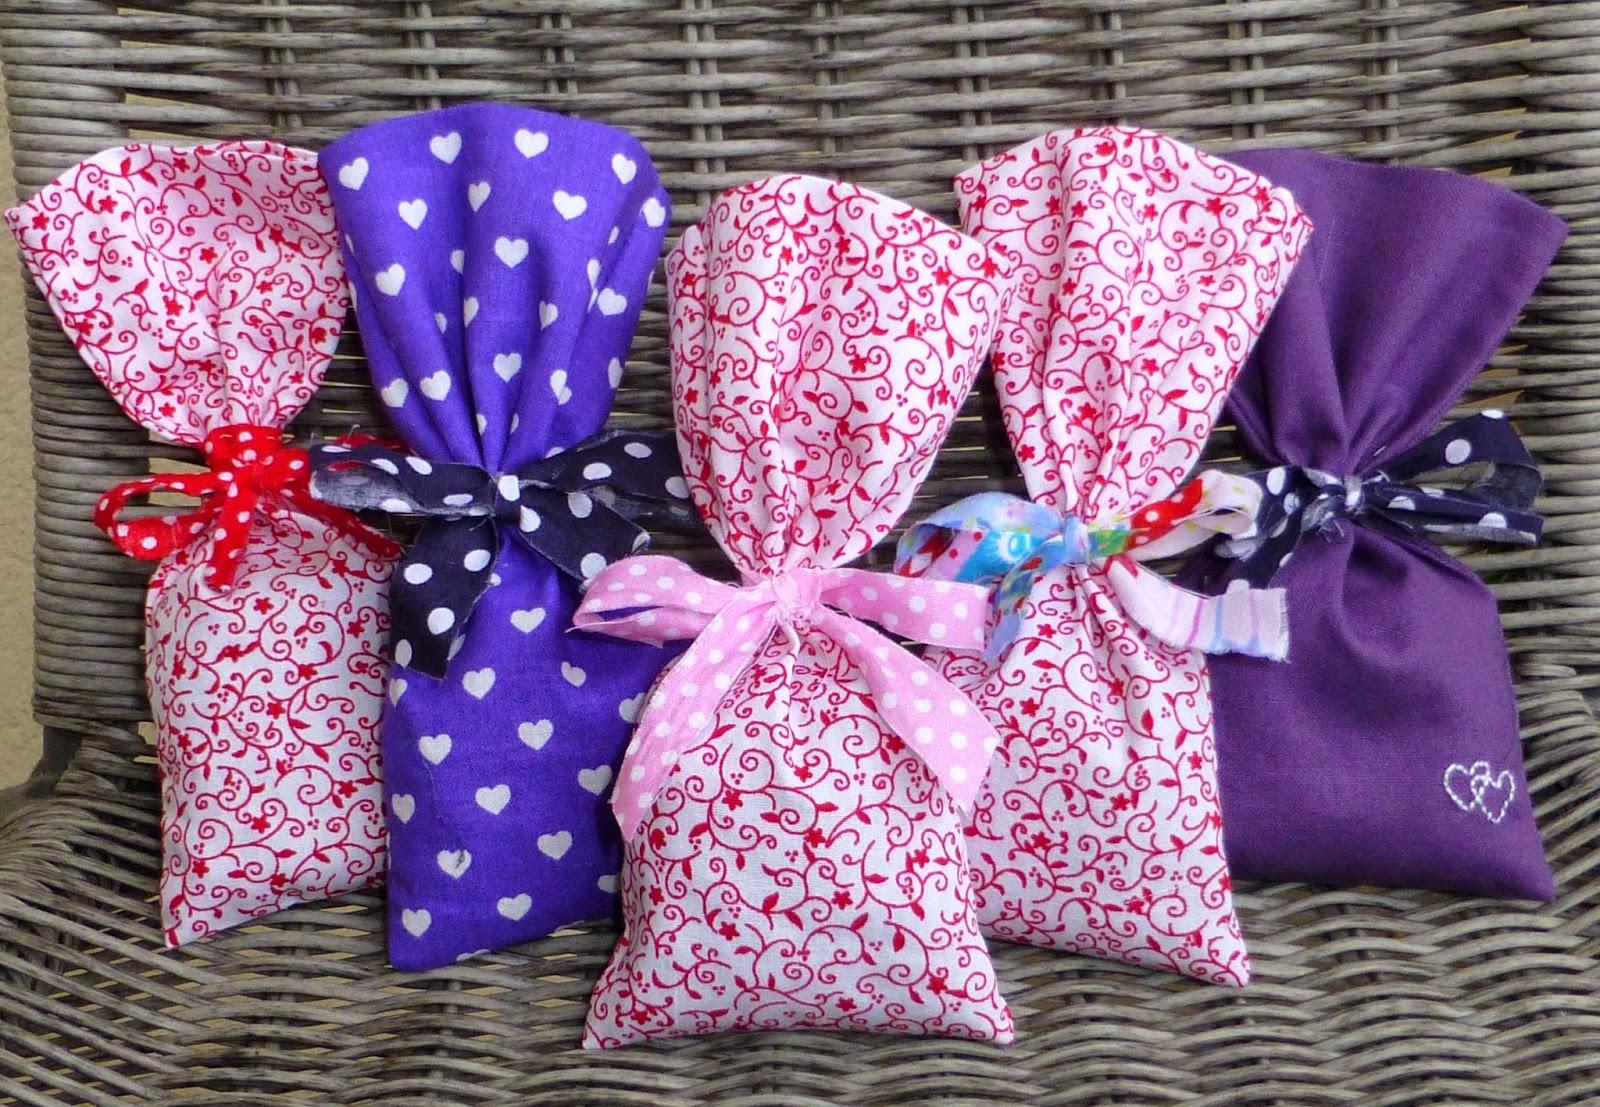 Nadelgrafie: Lavendelsäckchen nähen